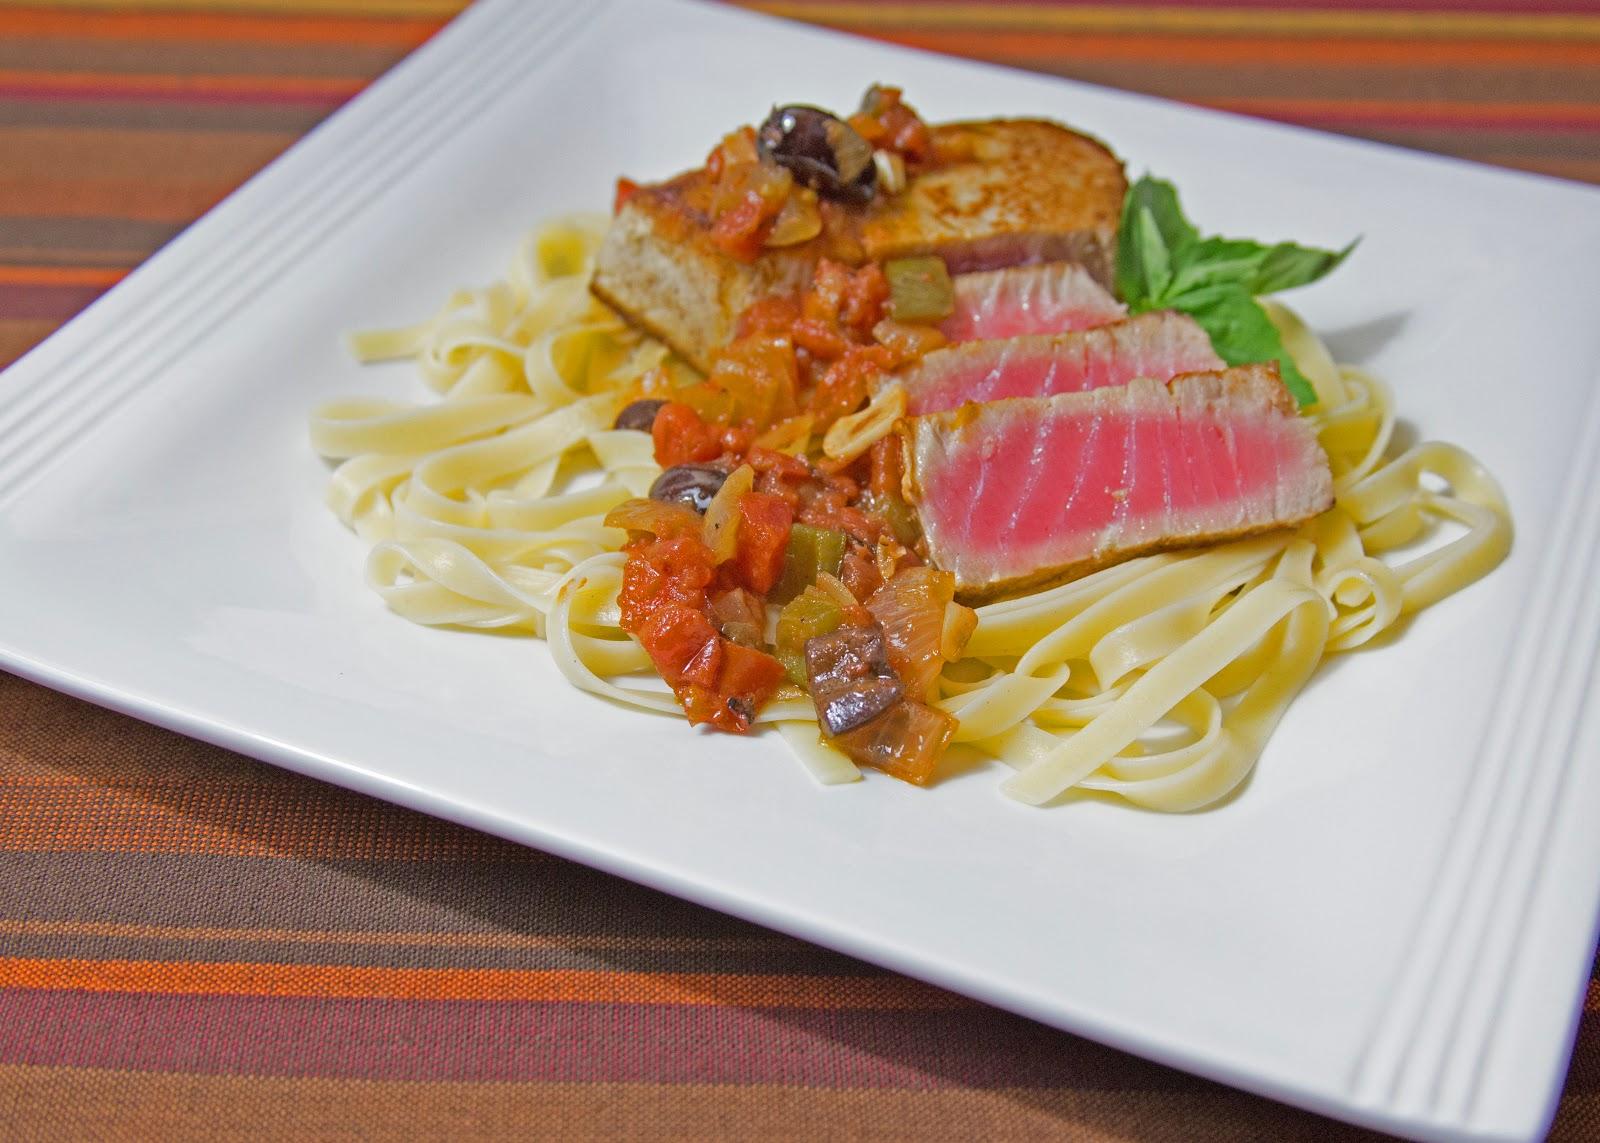 Tom and Anita : Ahi Tuna Over Pasta with Olive, Basil and Tomato Sauce